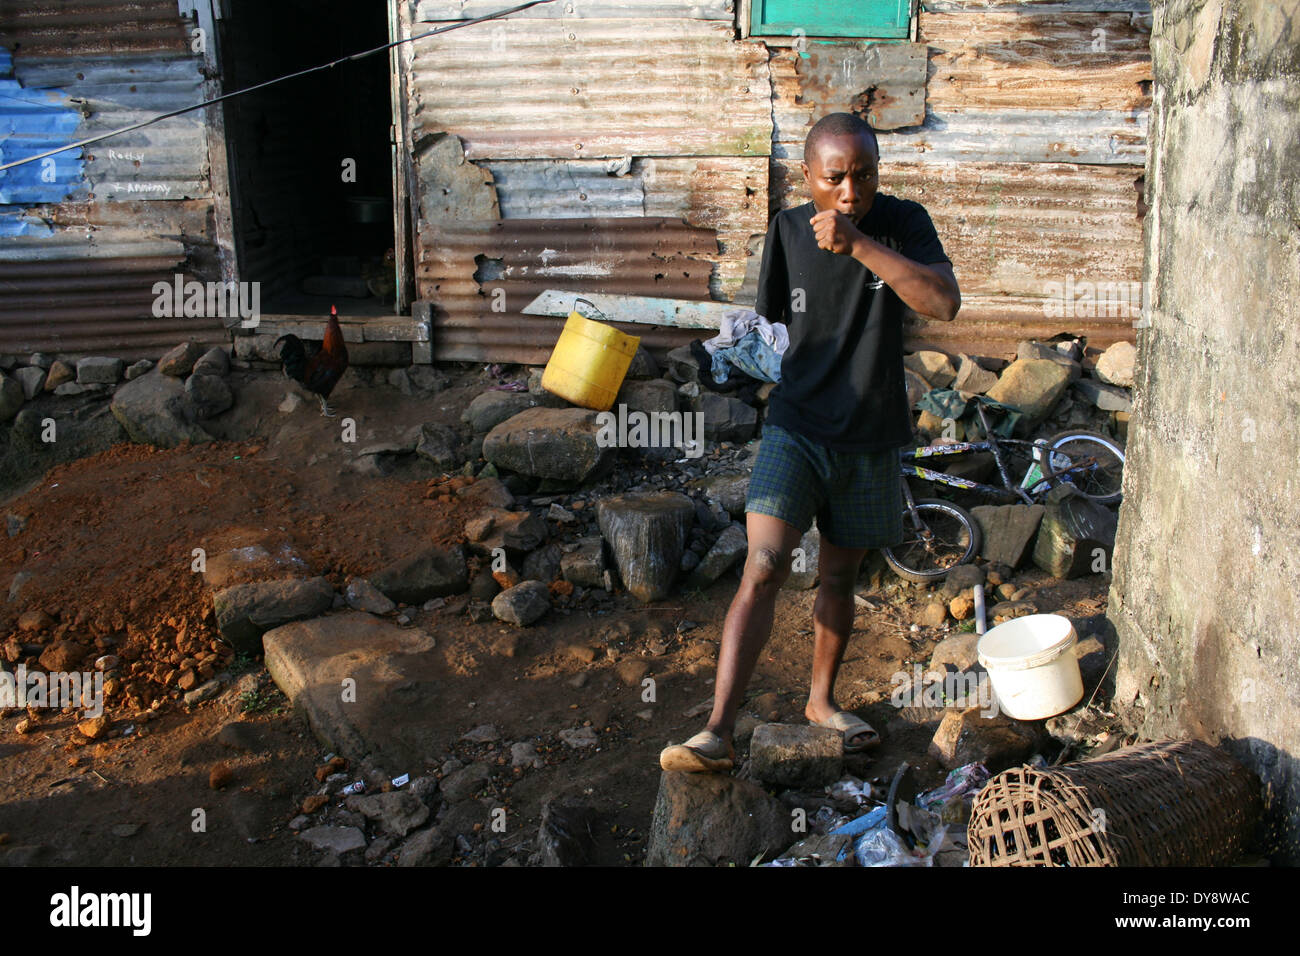 Liberia. Monrovia. Joseph Allen brushing his teeth. He lost his arm while seeking refuge during the liberian civil war. He now f - Stock Image